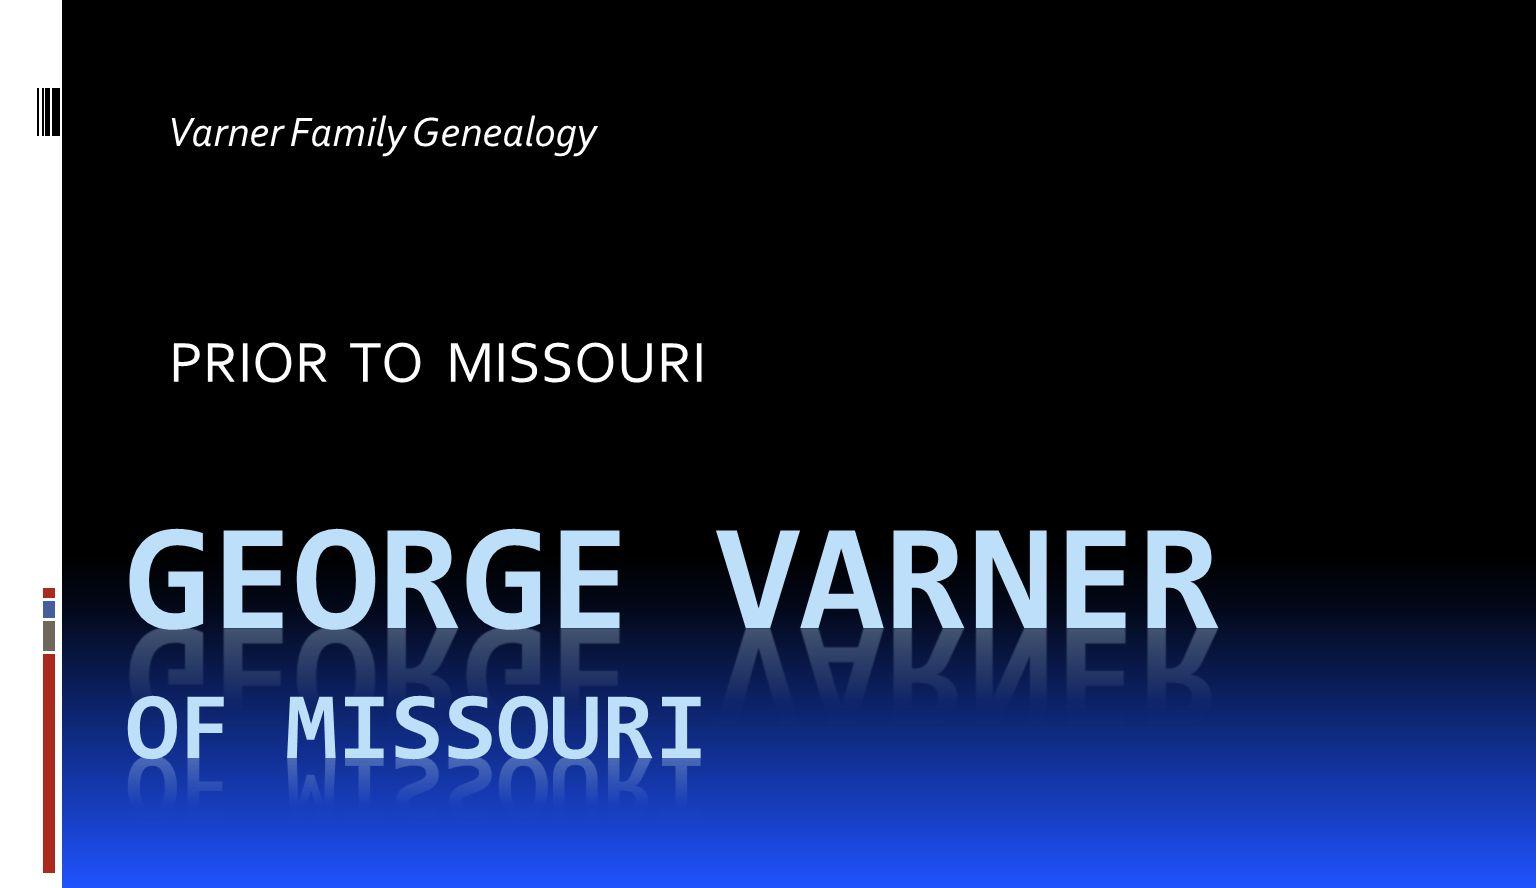 PRIOR TO MISSOURI Varner Family Genealogy